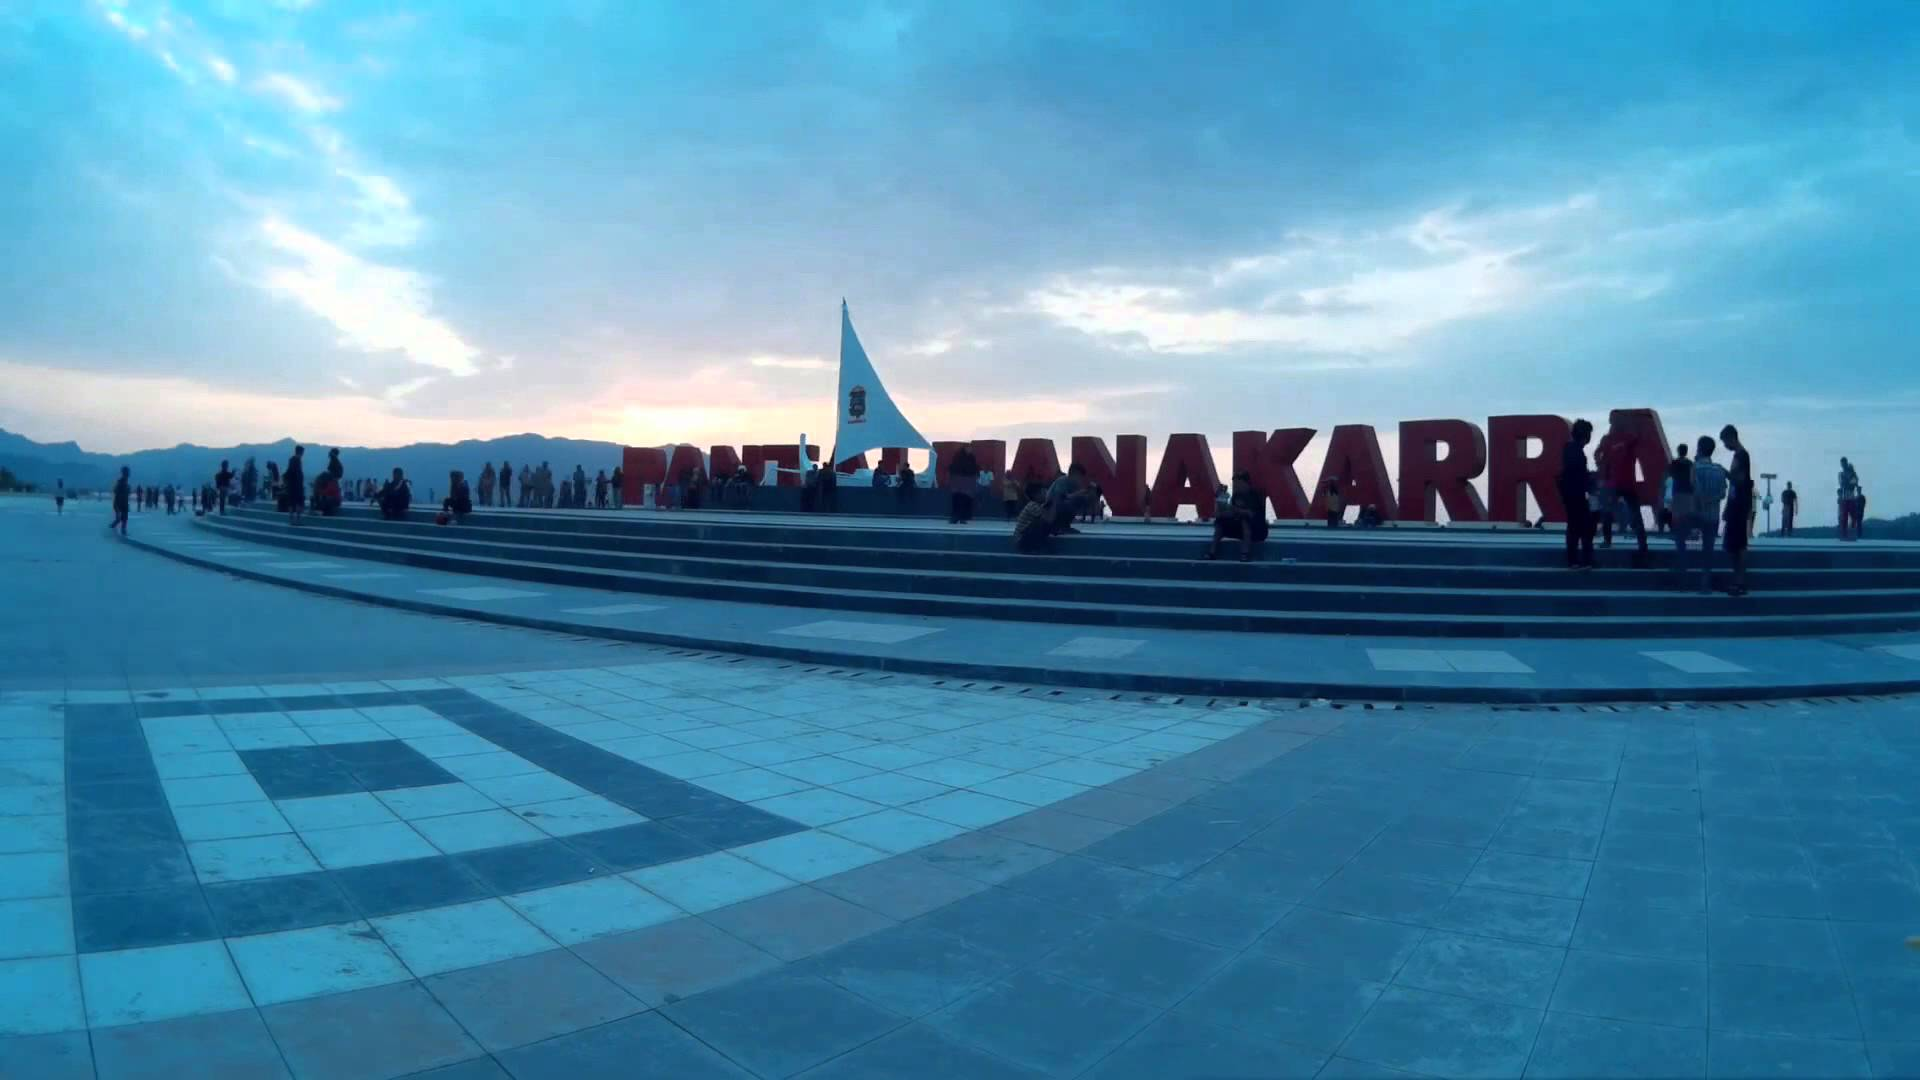 5 Tempat Wisata Pantai Memukau Sulawesi Barat Manakkara Manakarra Kab